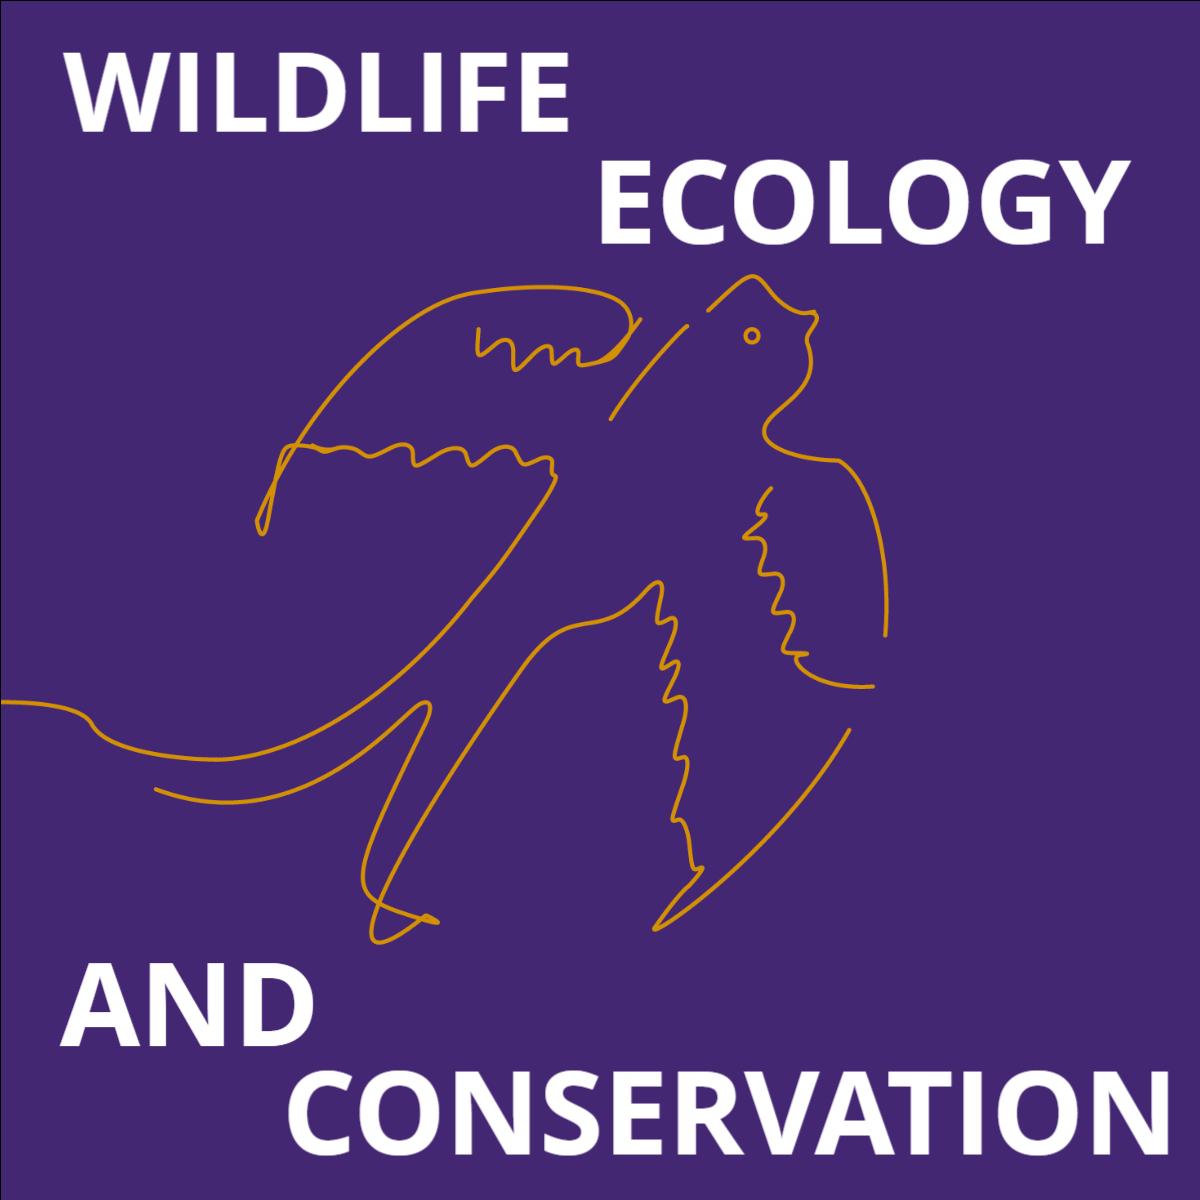 Wildlife Eco Conservation